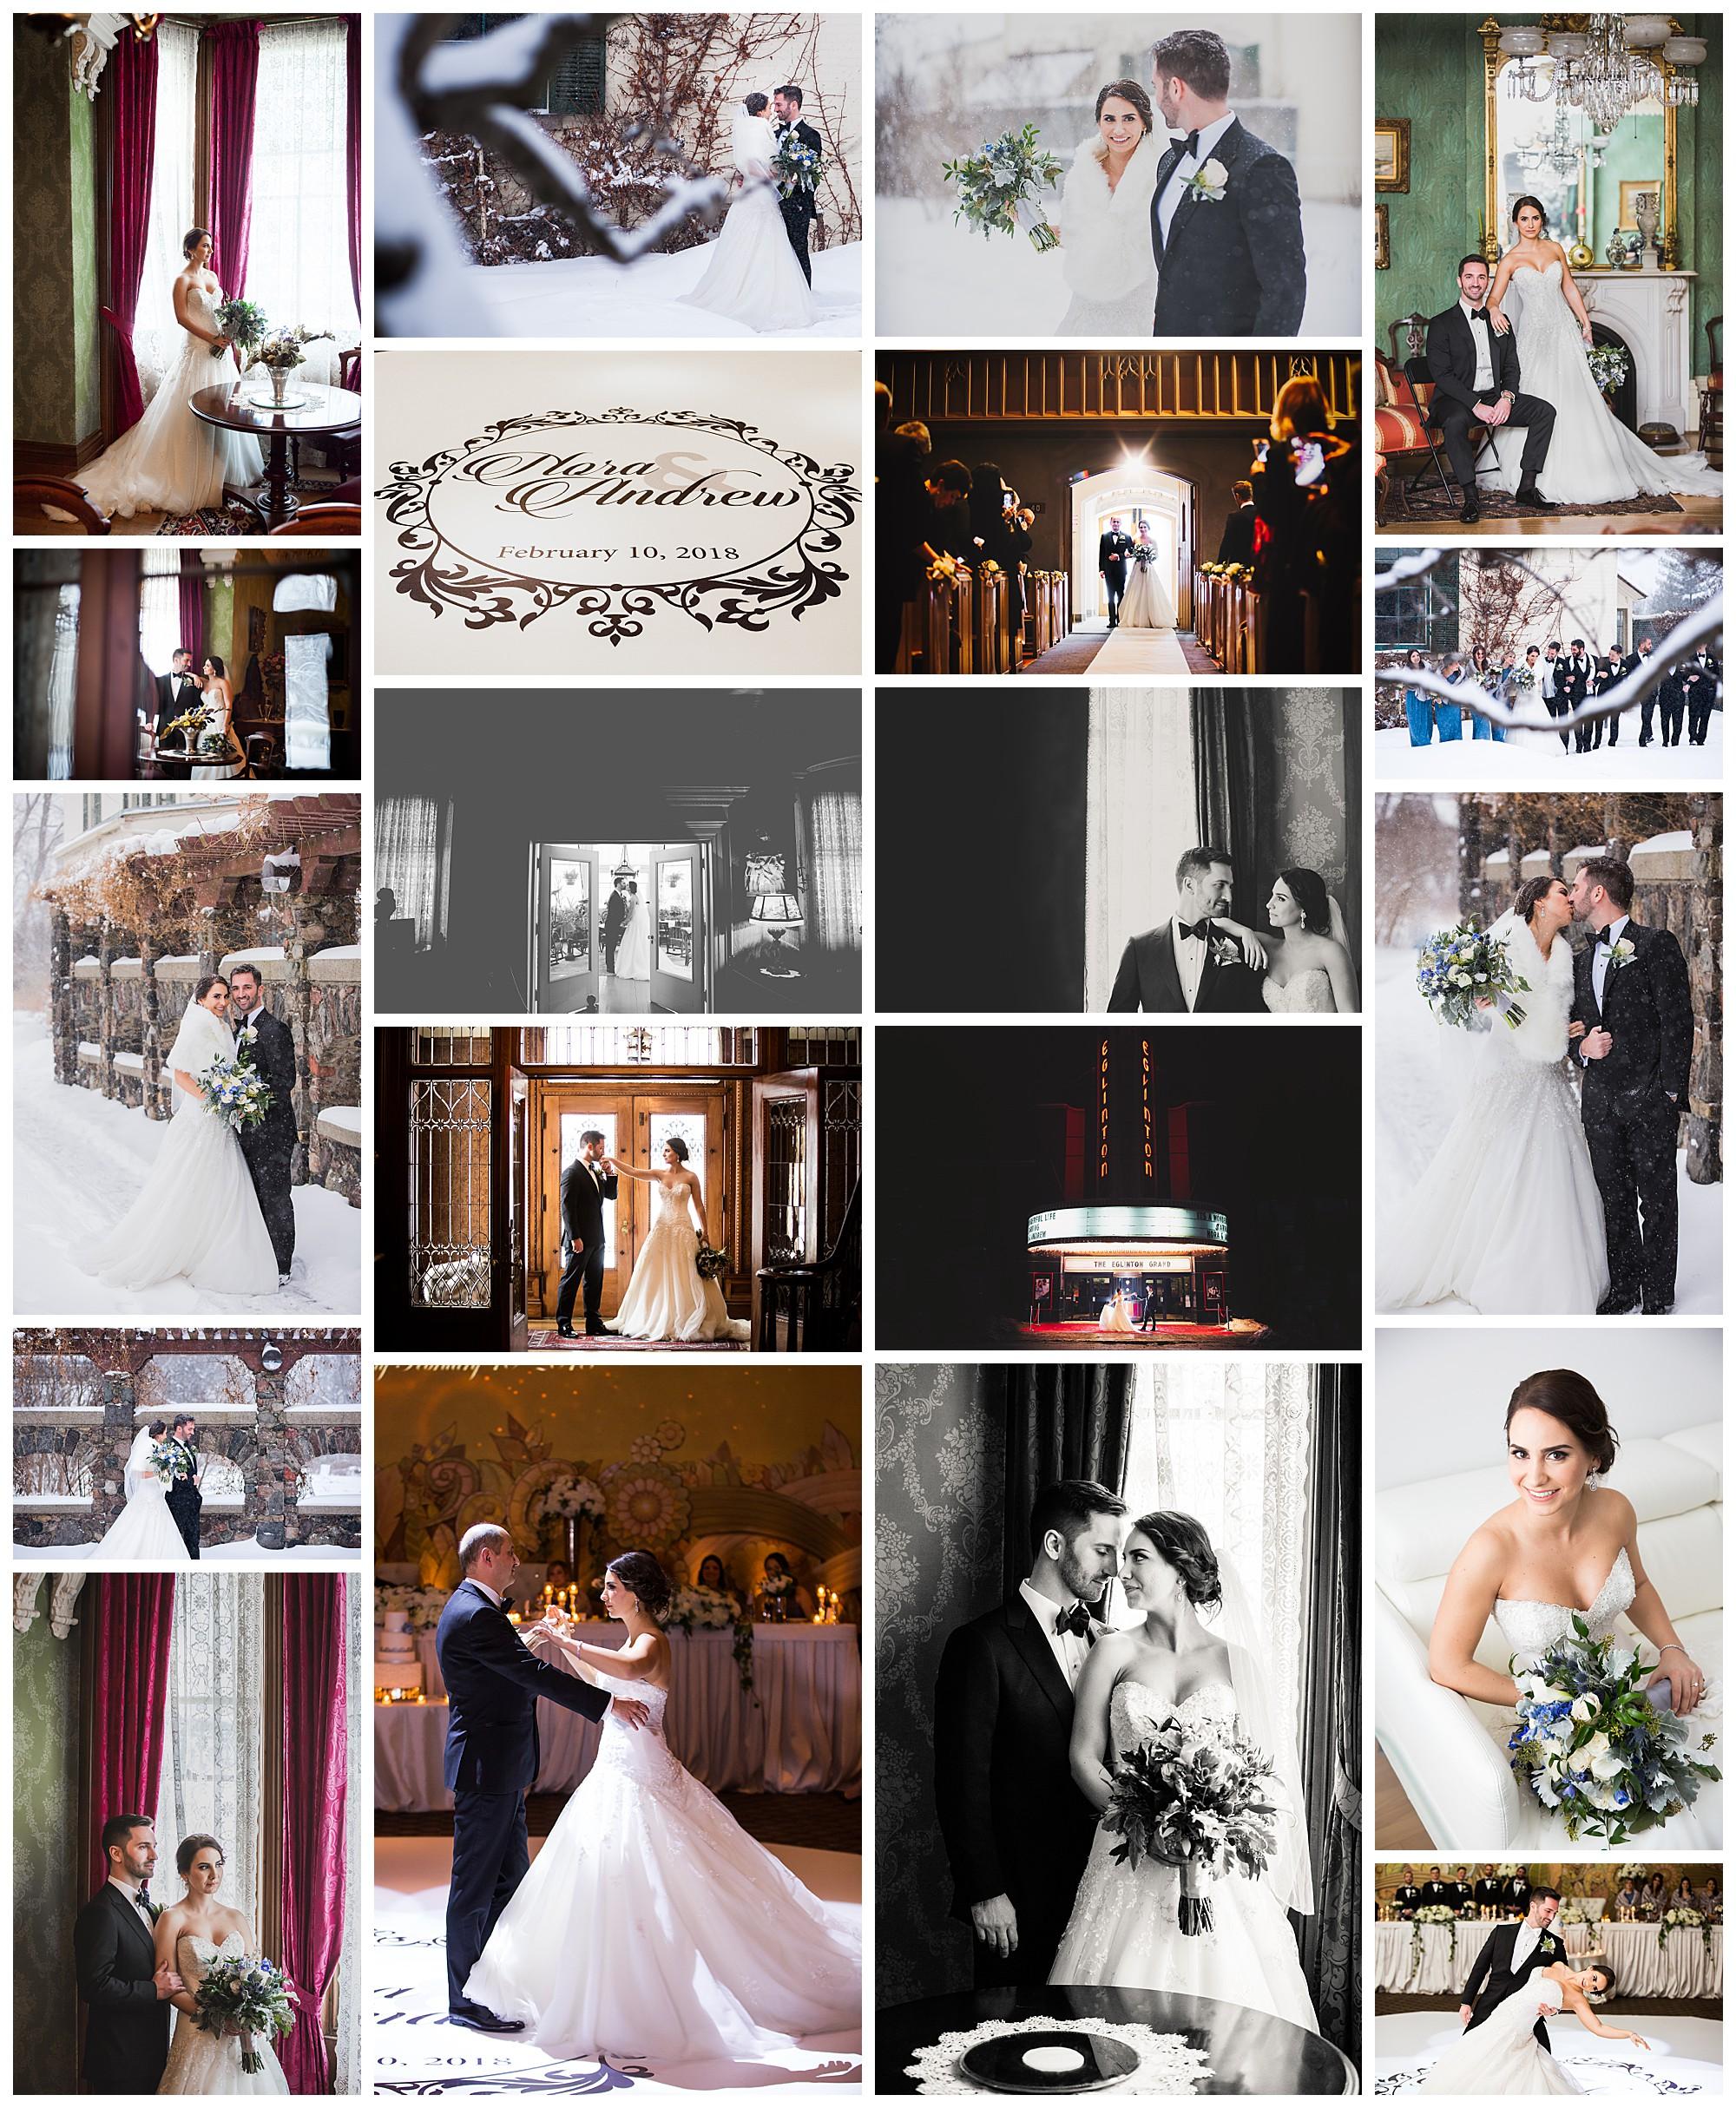 Eglinton Grand Theatre wedding photography by VanDaele & Russell, Toronto Ontario